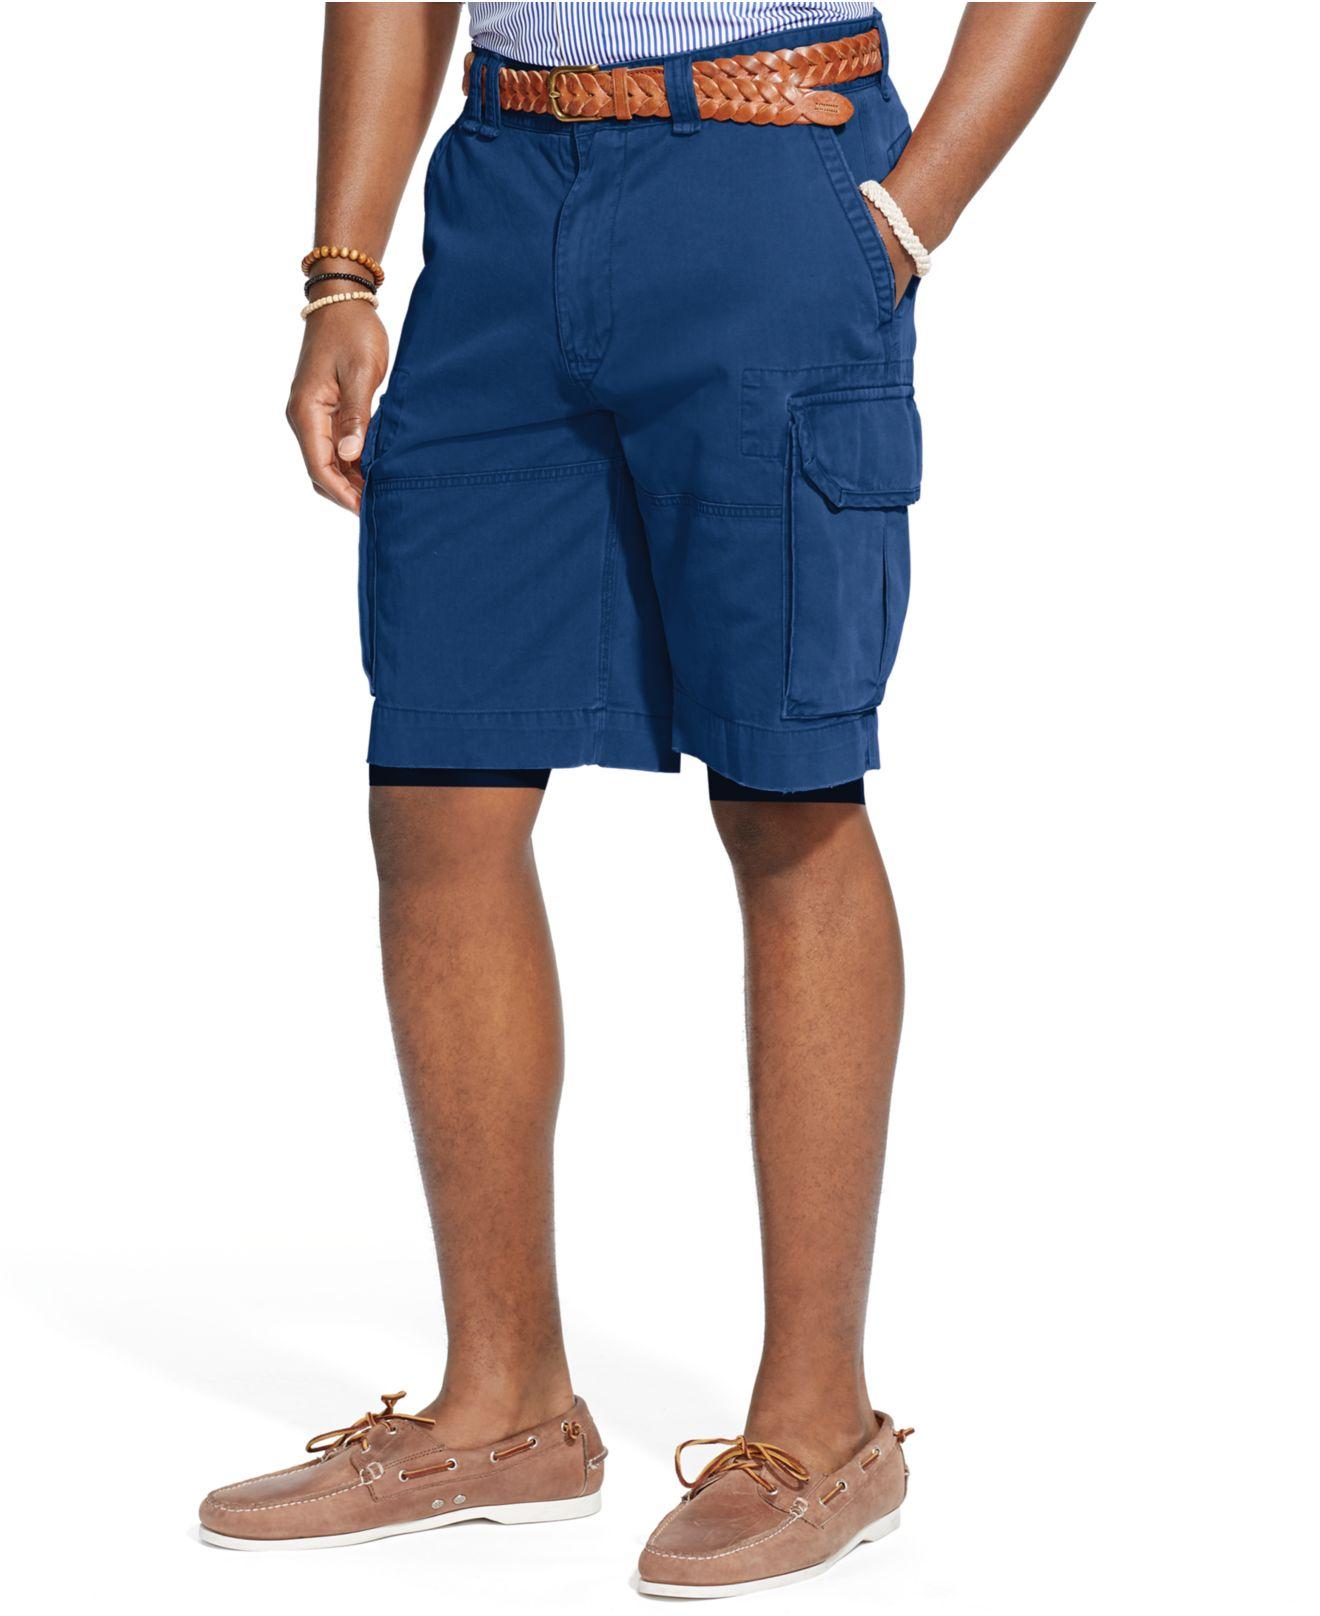 df13c488 Polo Ralph Lauren Mens Shorts Core 10.5 Classic Gellar Cargos | RLDM